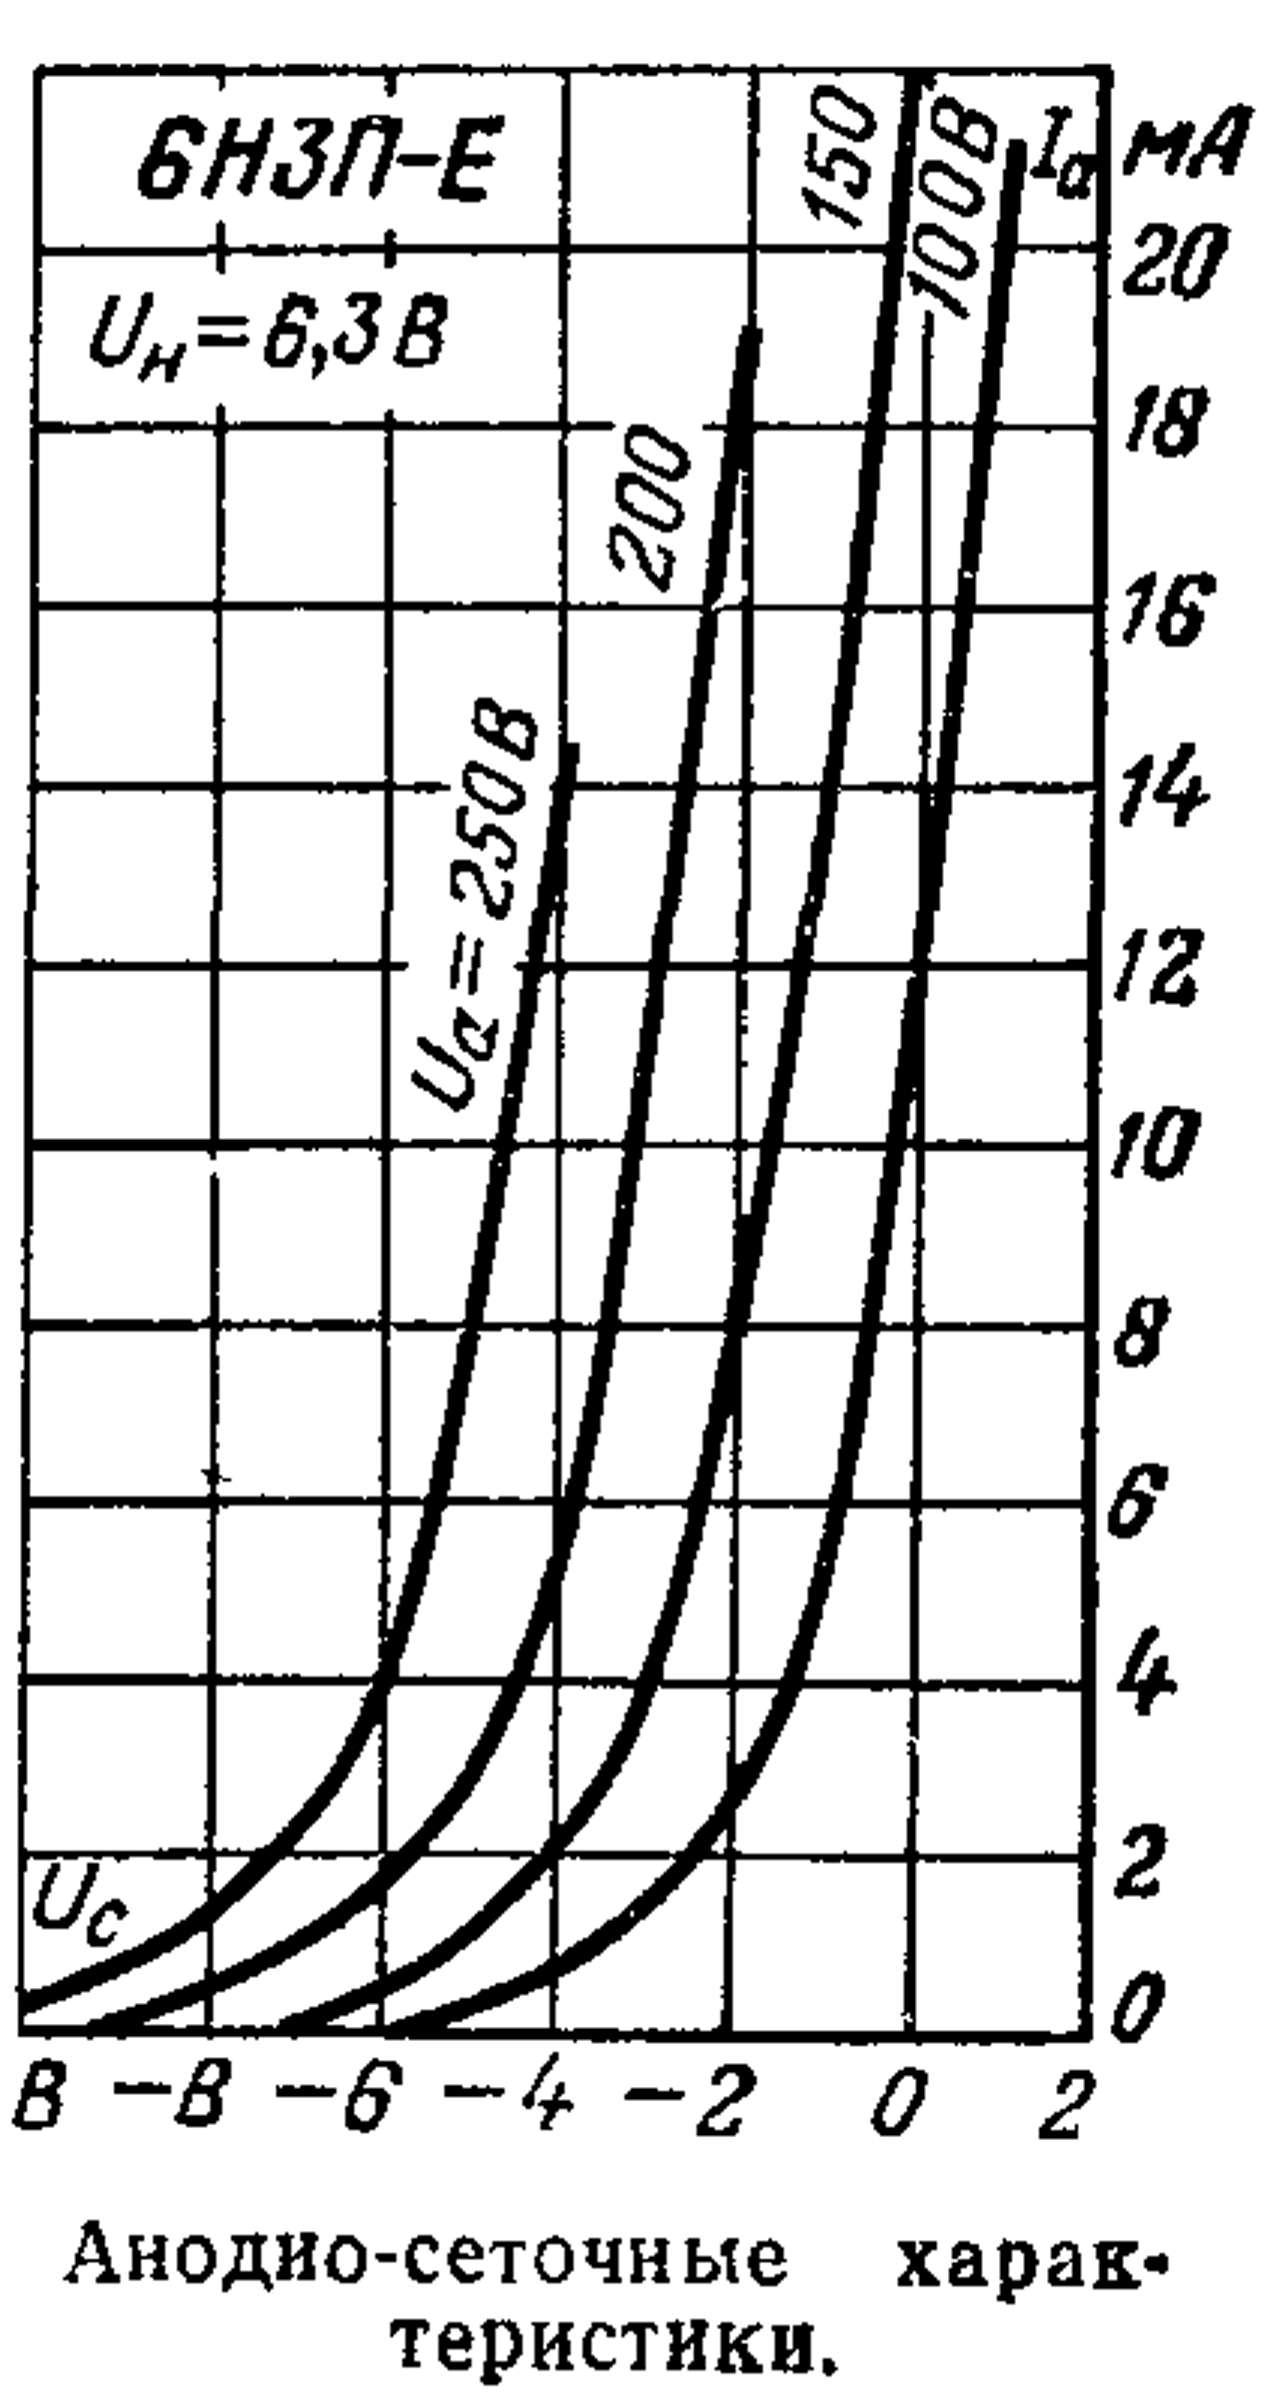 Параметры радиолампы 6Н3П-Е